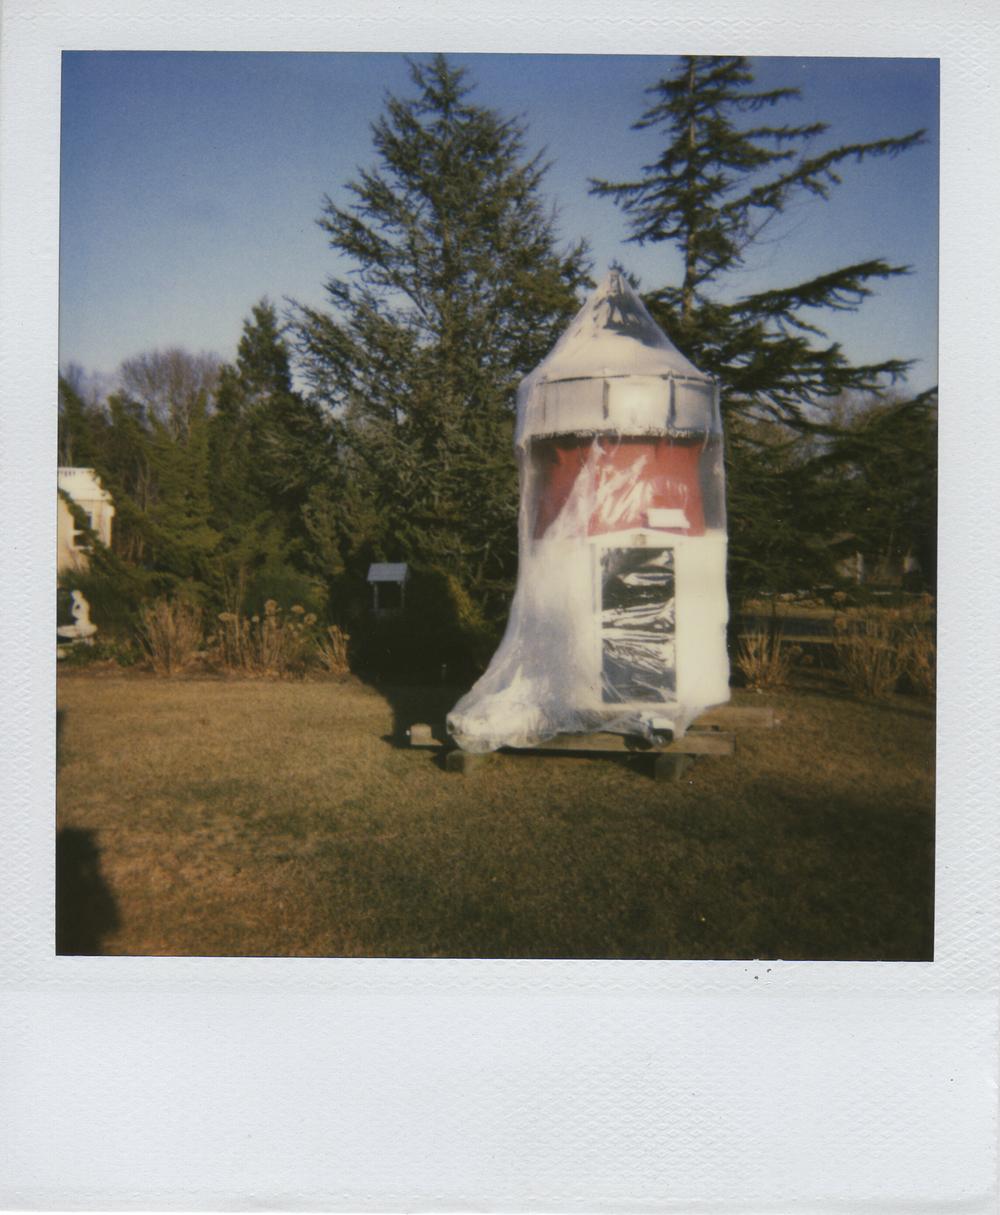 jlaurence-polaroid-053.jpg